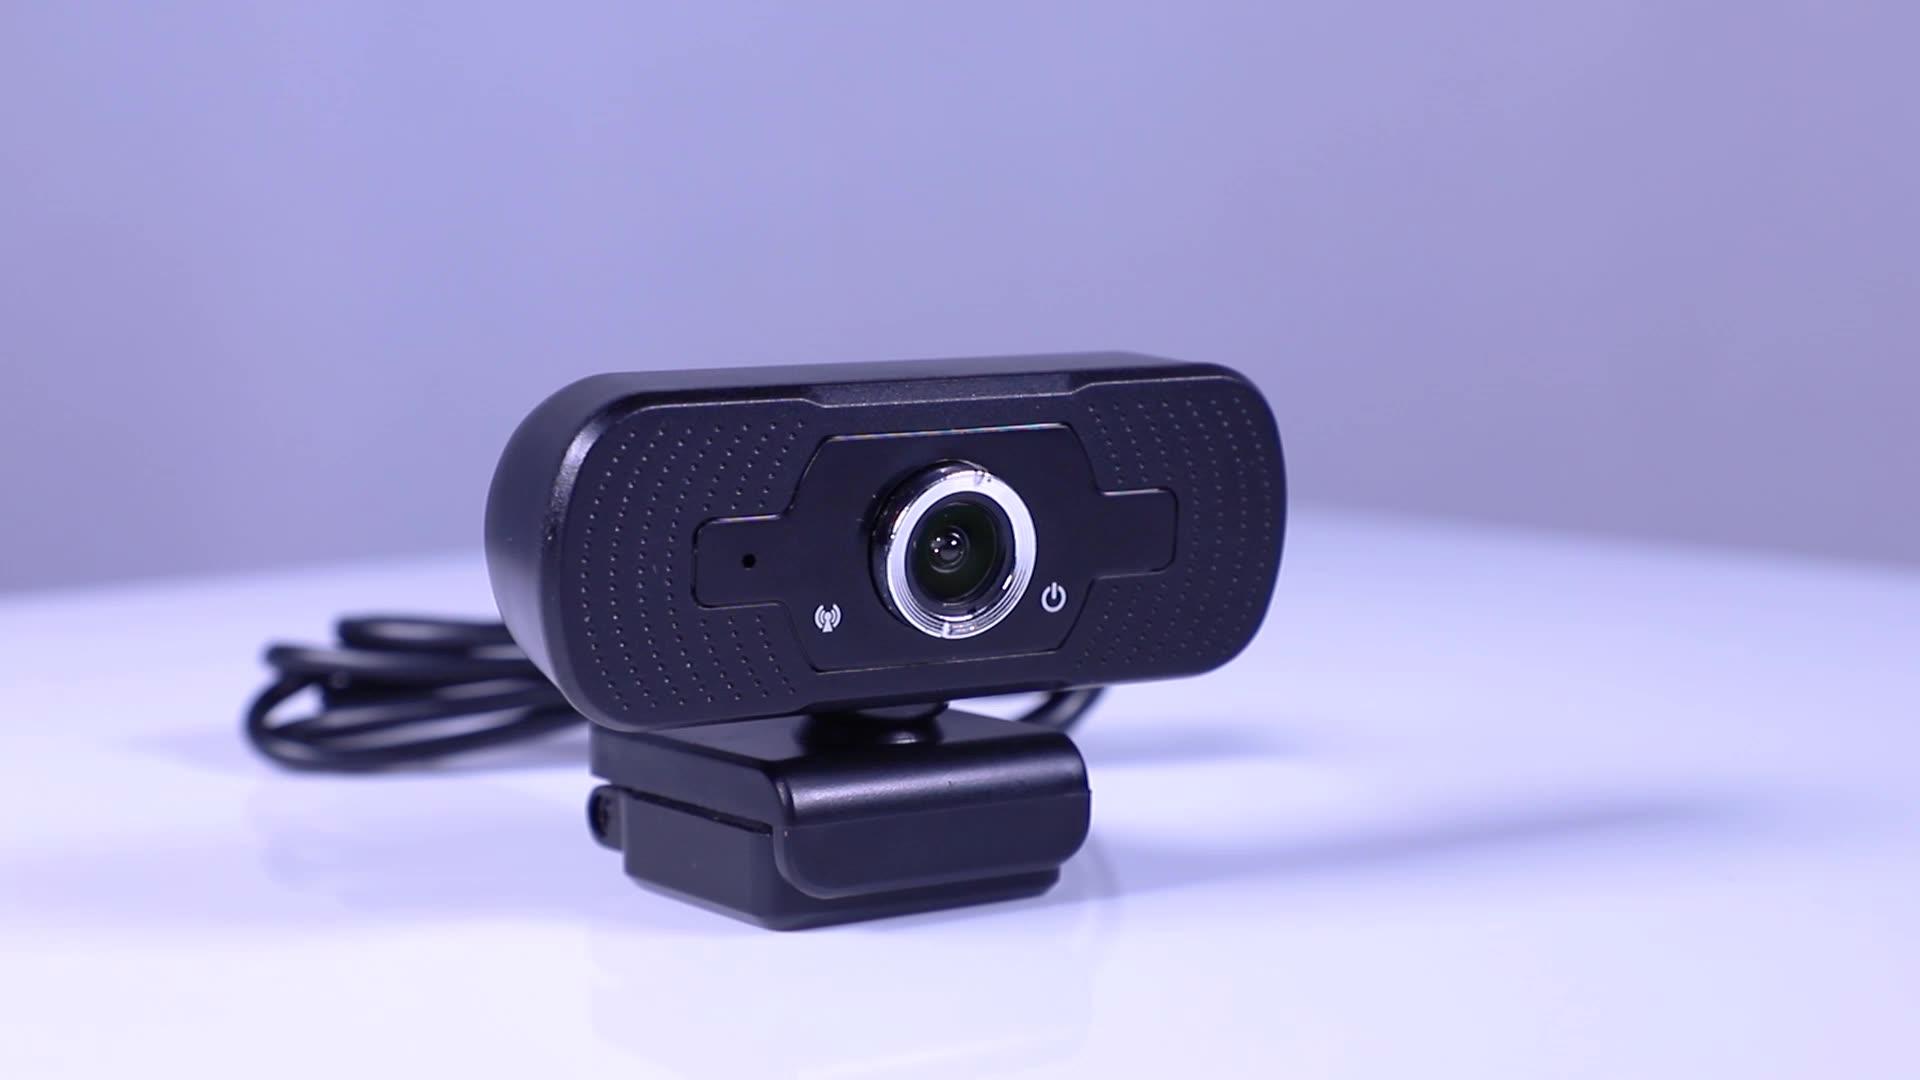 Çin ayarı otomatik odaklama usb web kamera web kamerası 1080p full hd video konferans desteği pc mac